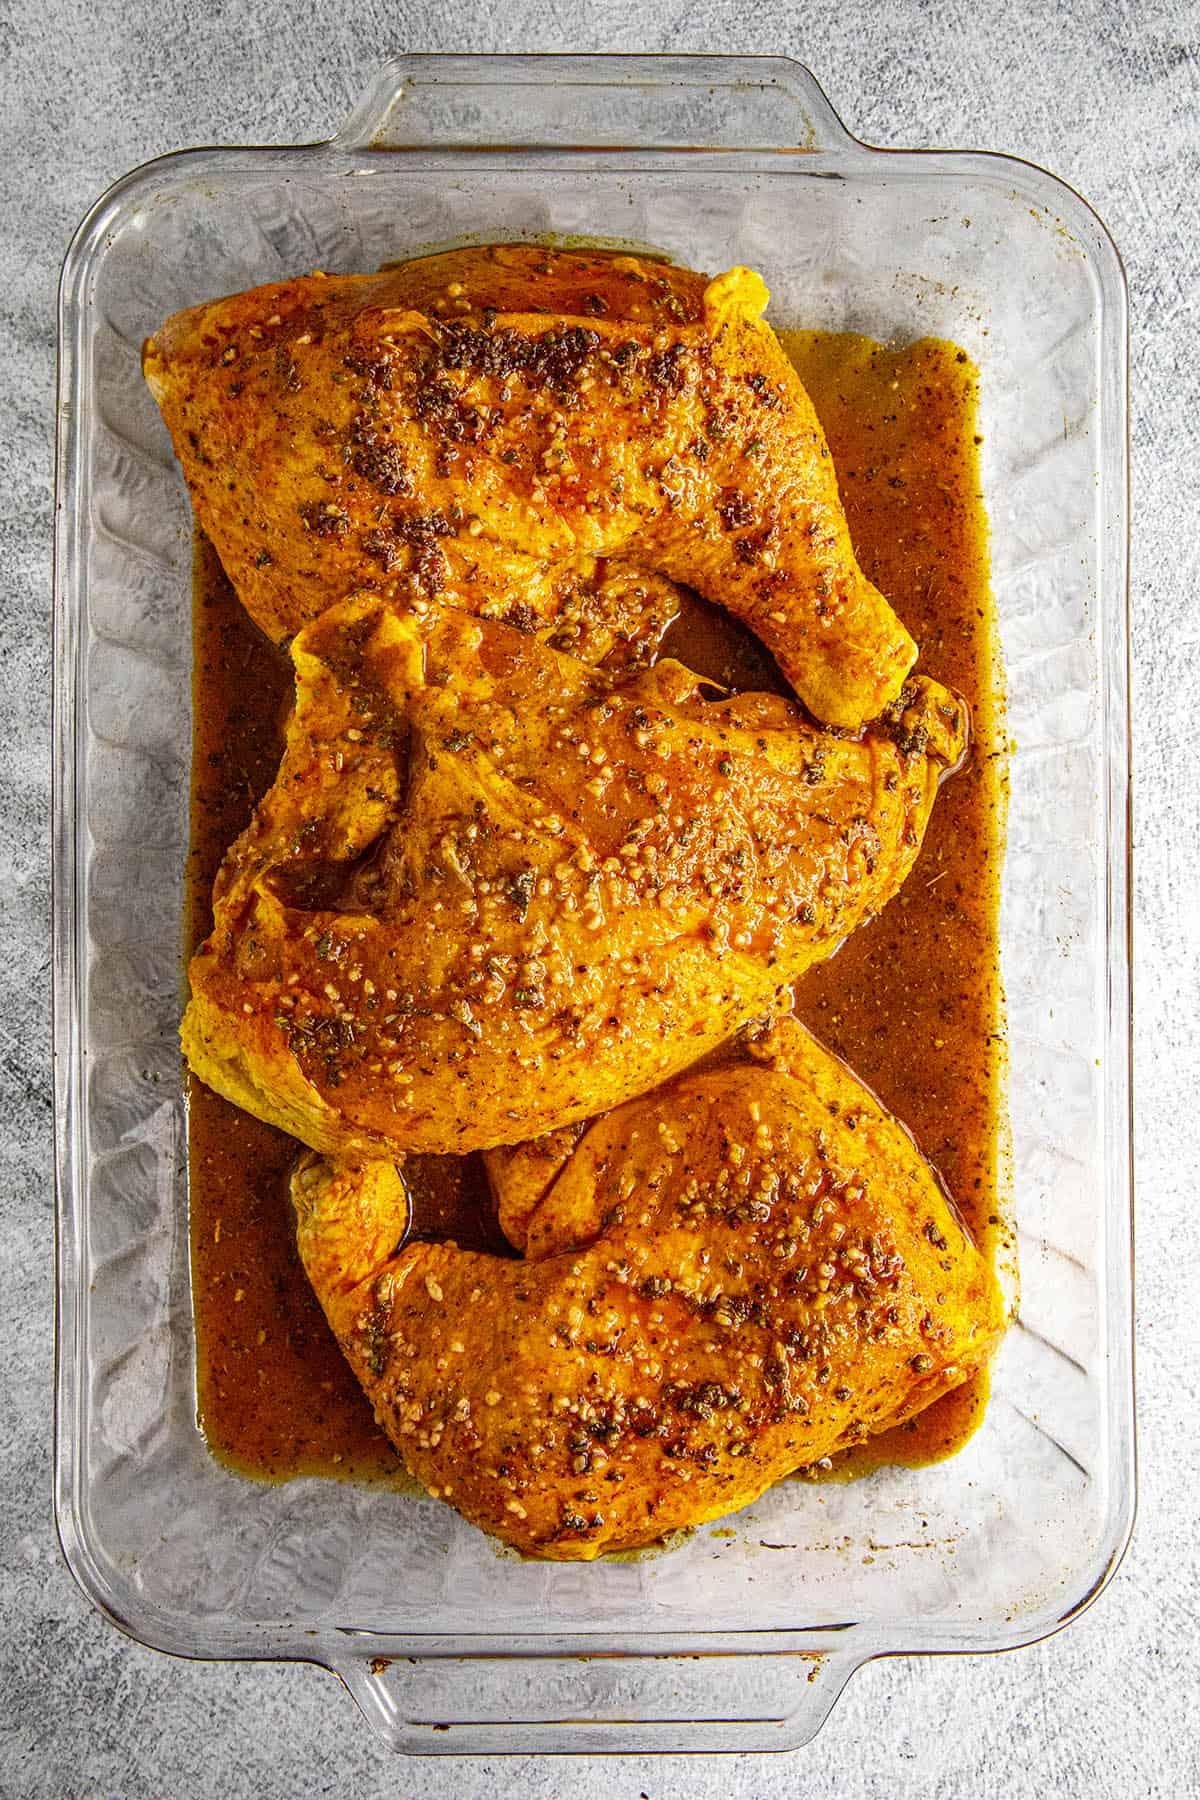 Pollo Asado (Mexican roast chicken) marinating in a dish